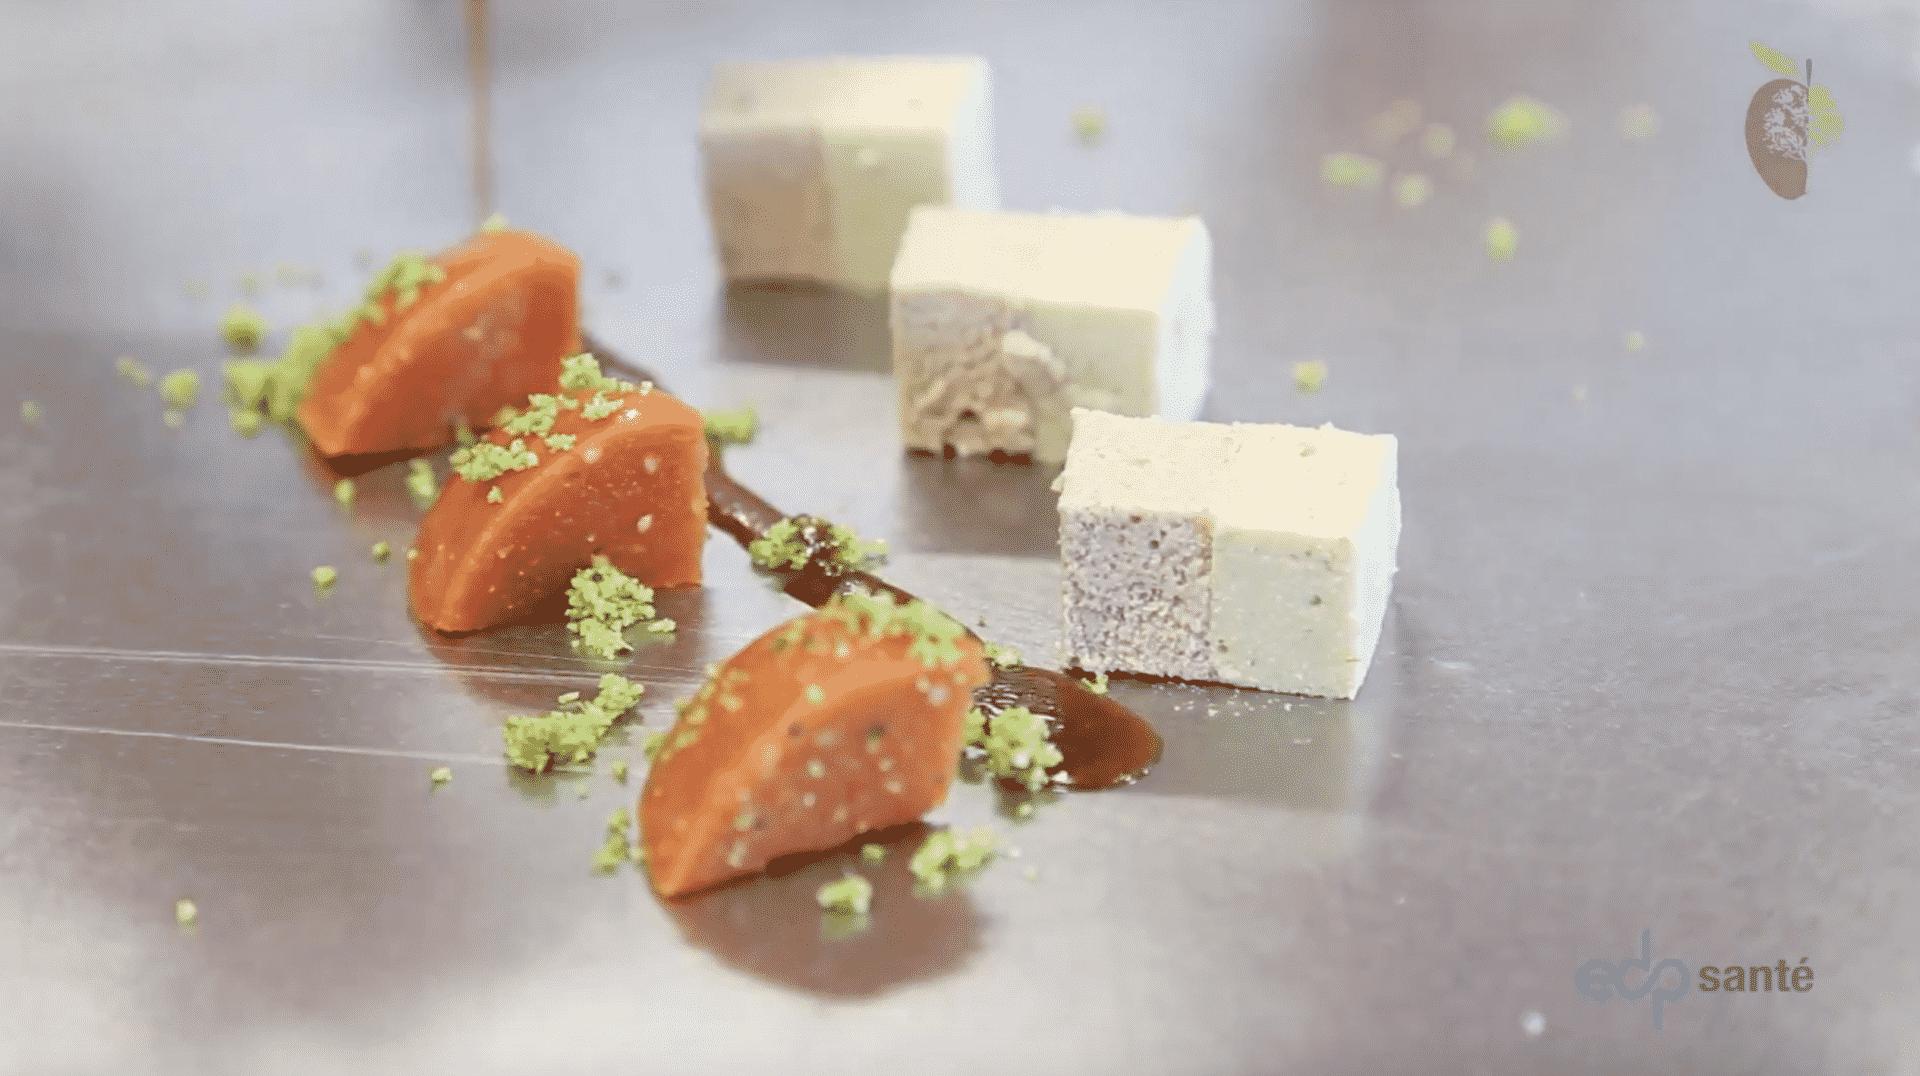 recette adaptee saute agneau tomate provencale thym